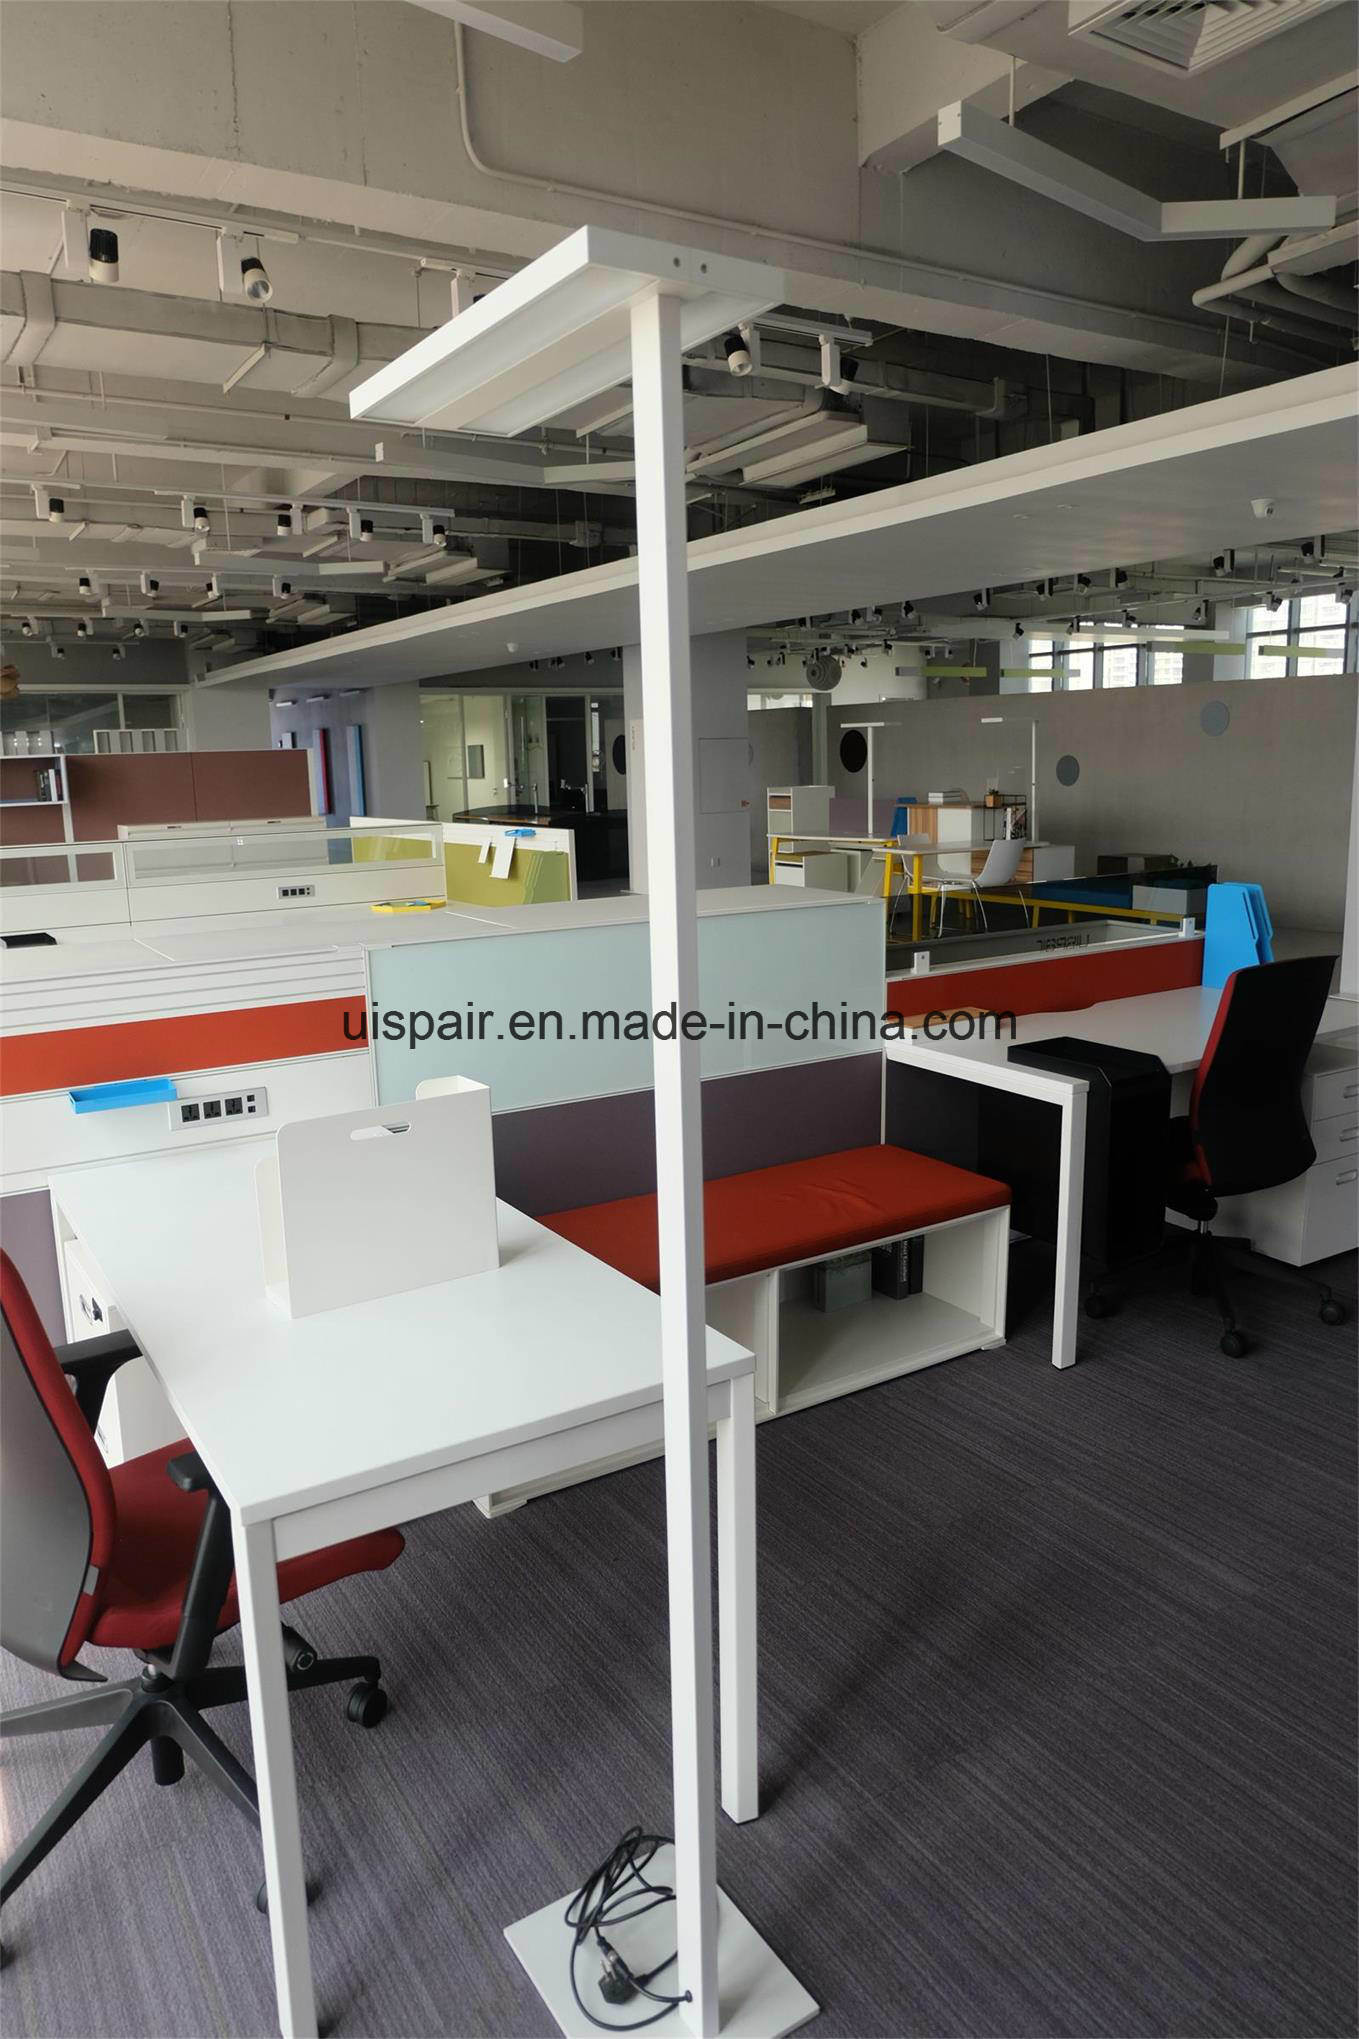 Guangzhou Uispair Modern Office 10W 32V Thin Rectangular Steel Base Aluminium Alloy LED Lamp Floor Lamp